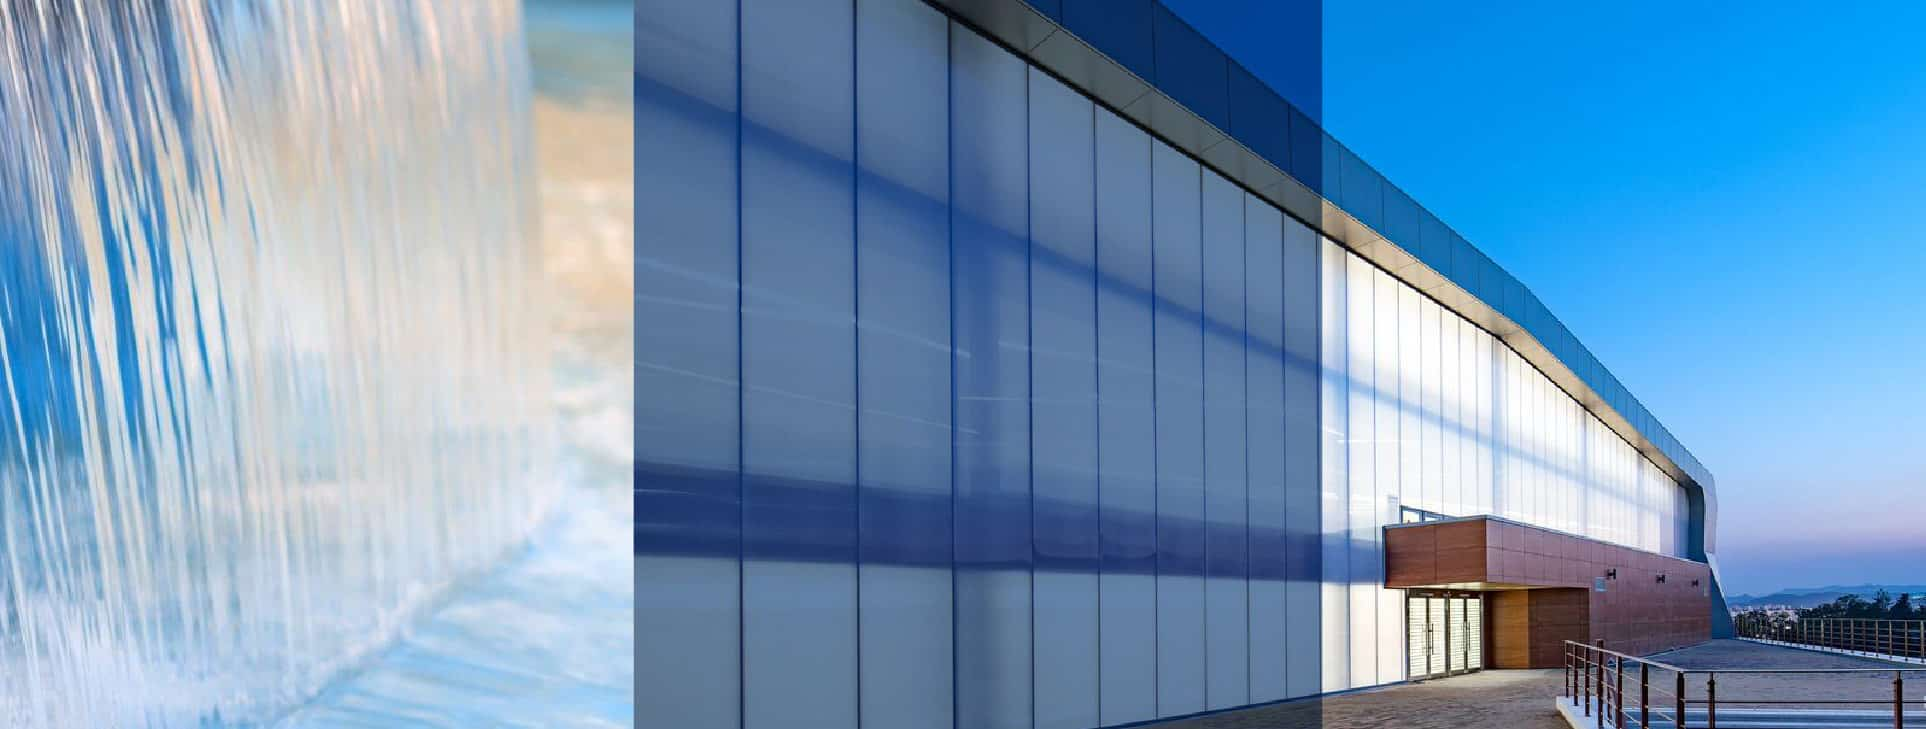 facade-system-Danpal